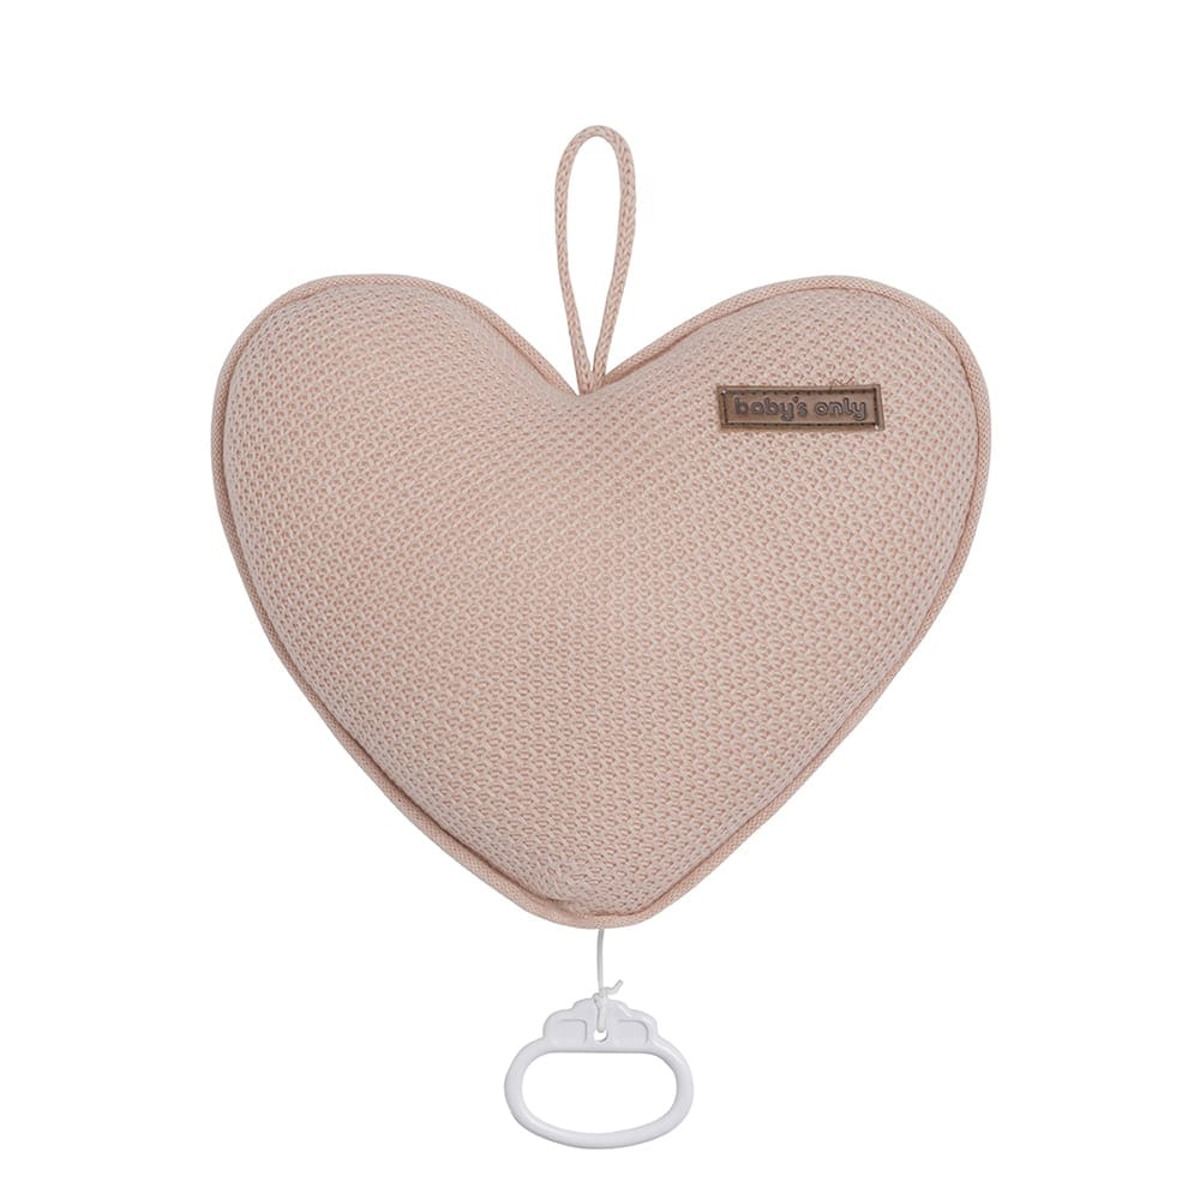 babys only 0204613 muziekdoos hart classic blush